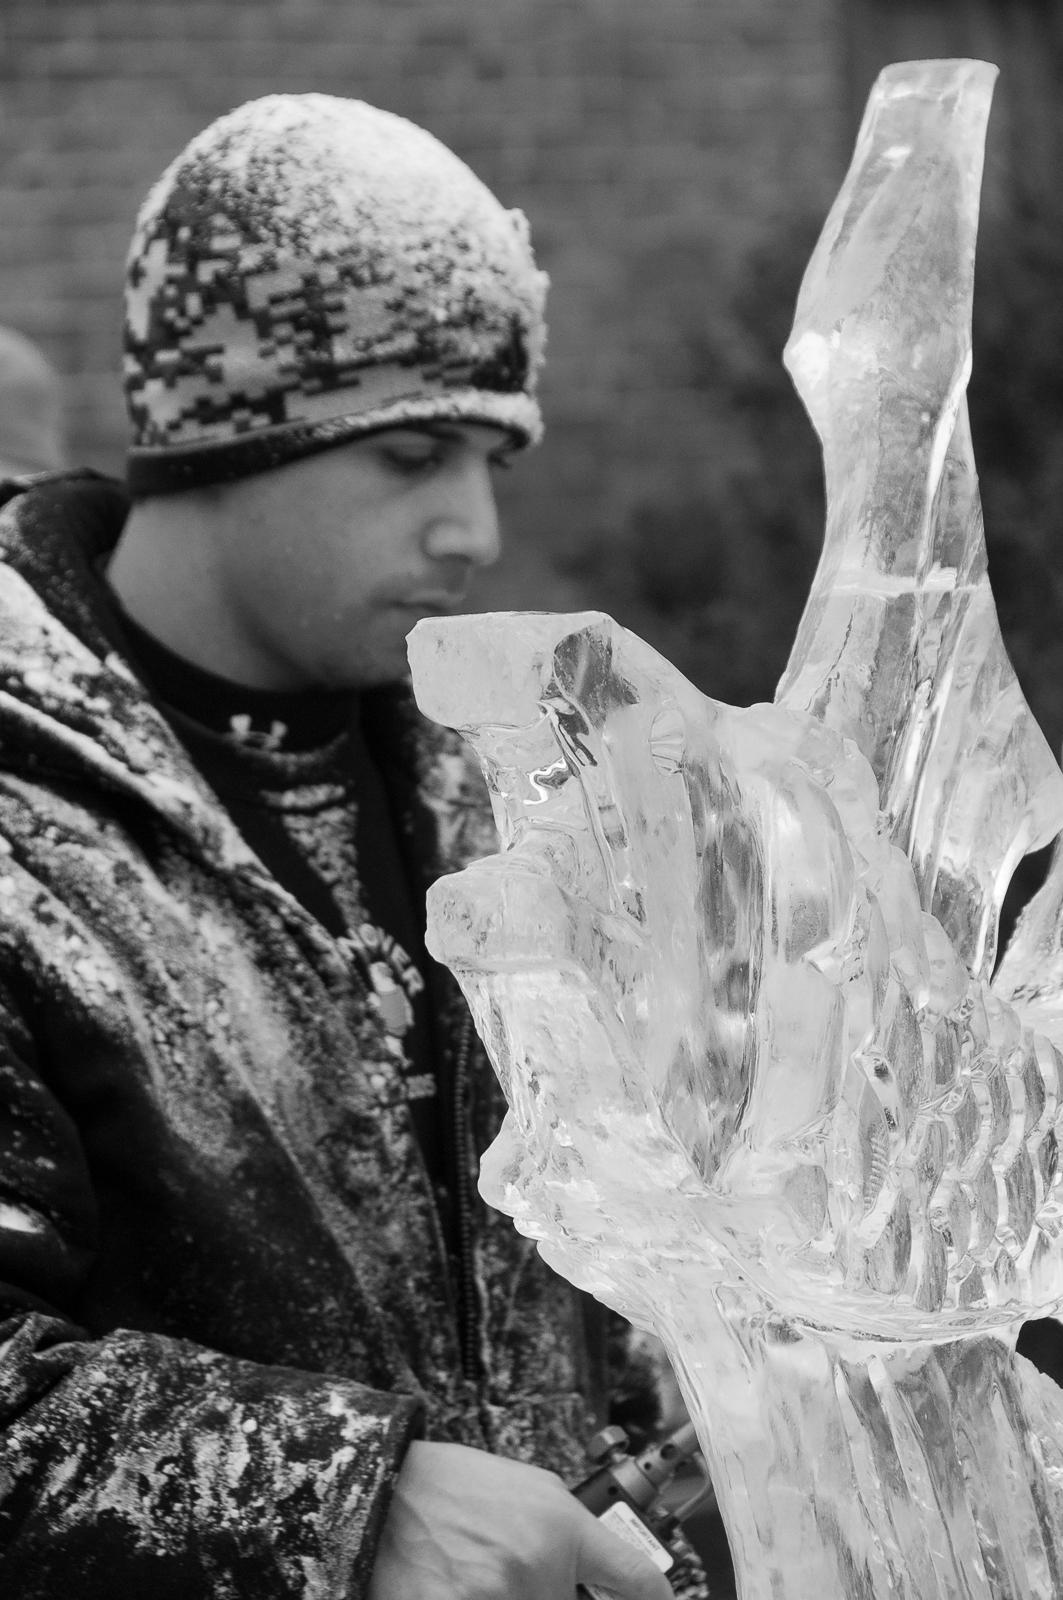 ice-sculpture-4339